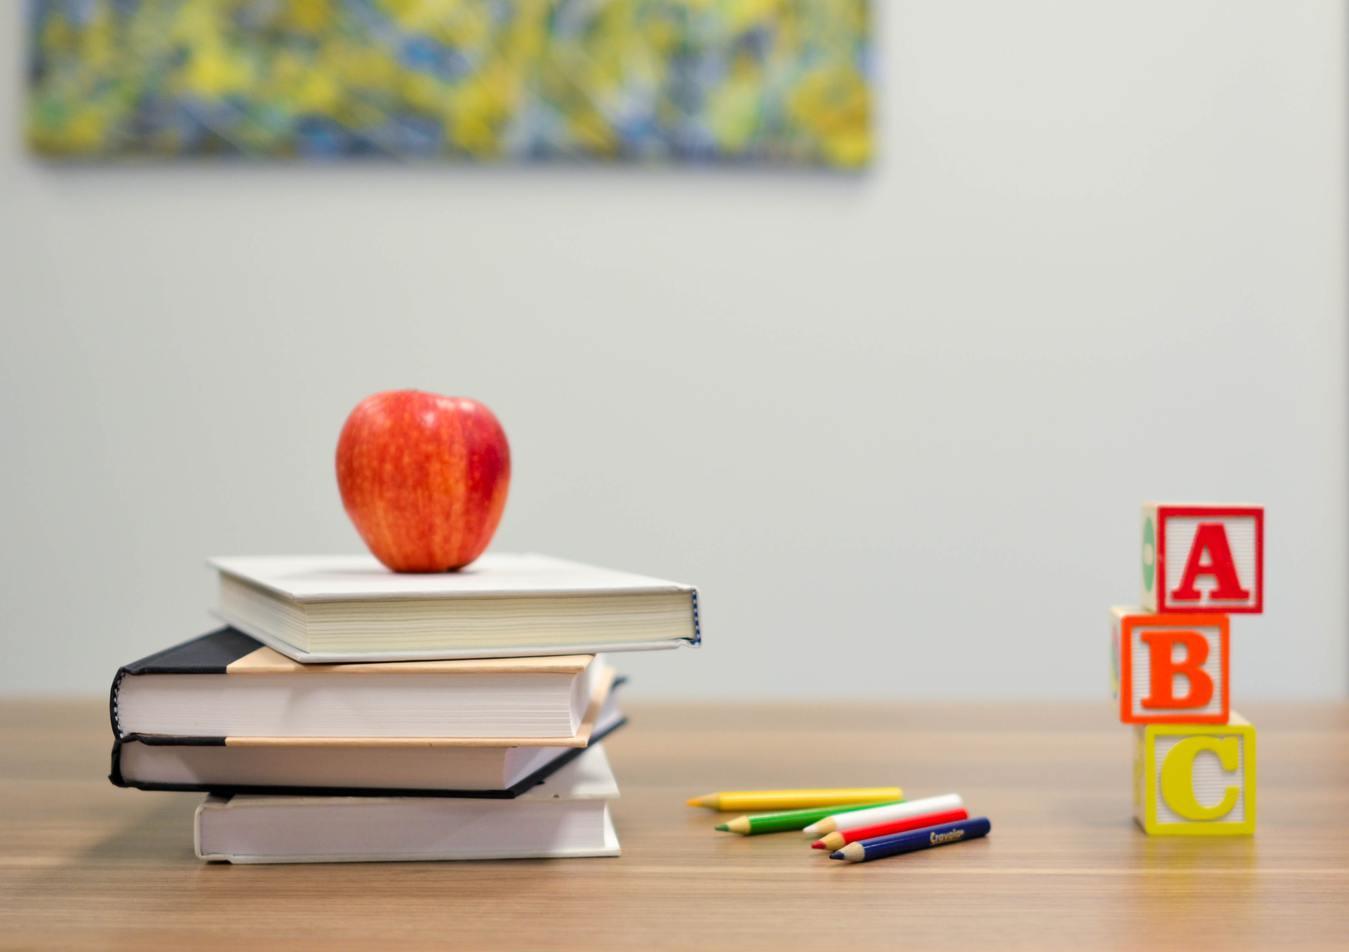 Boeken appel pennen abc op tafel